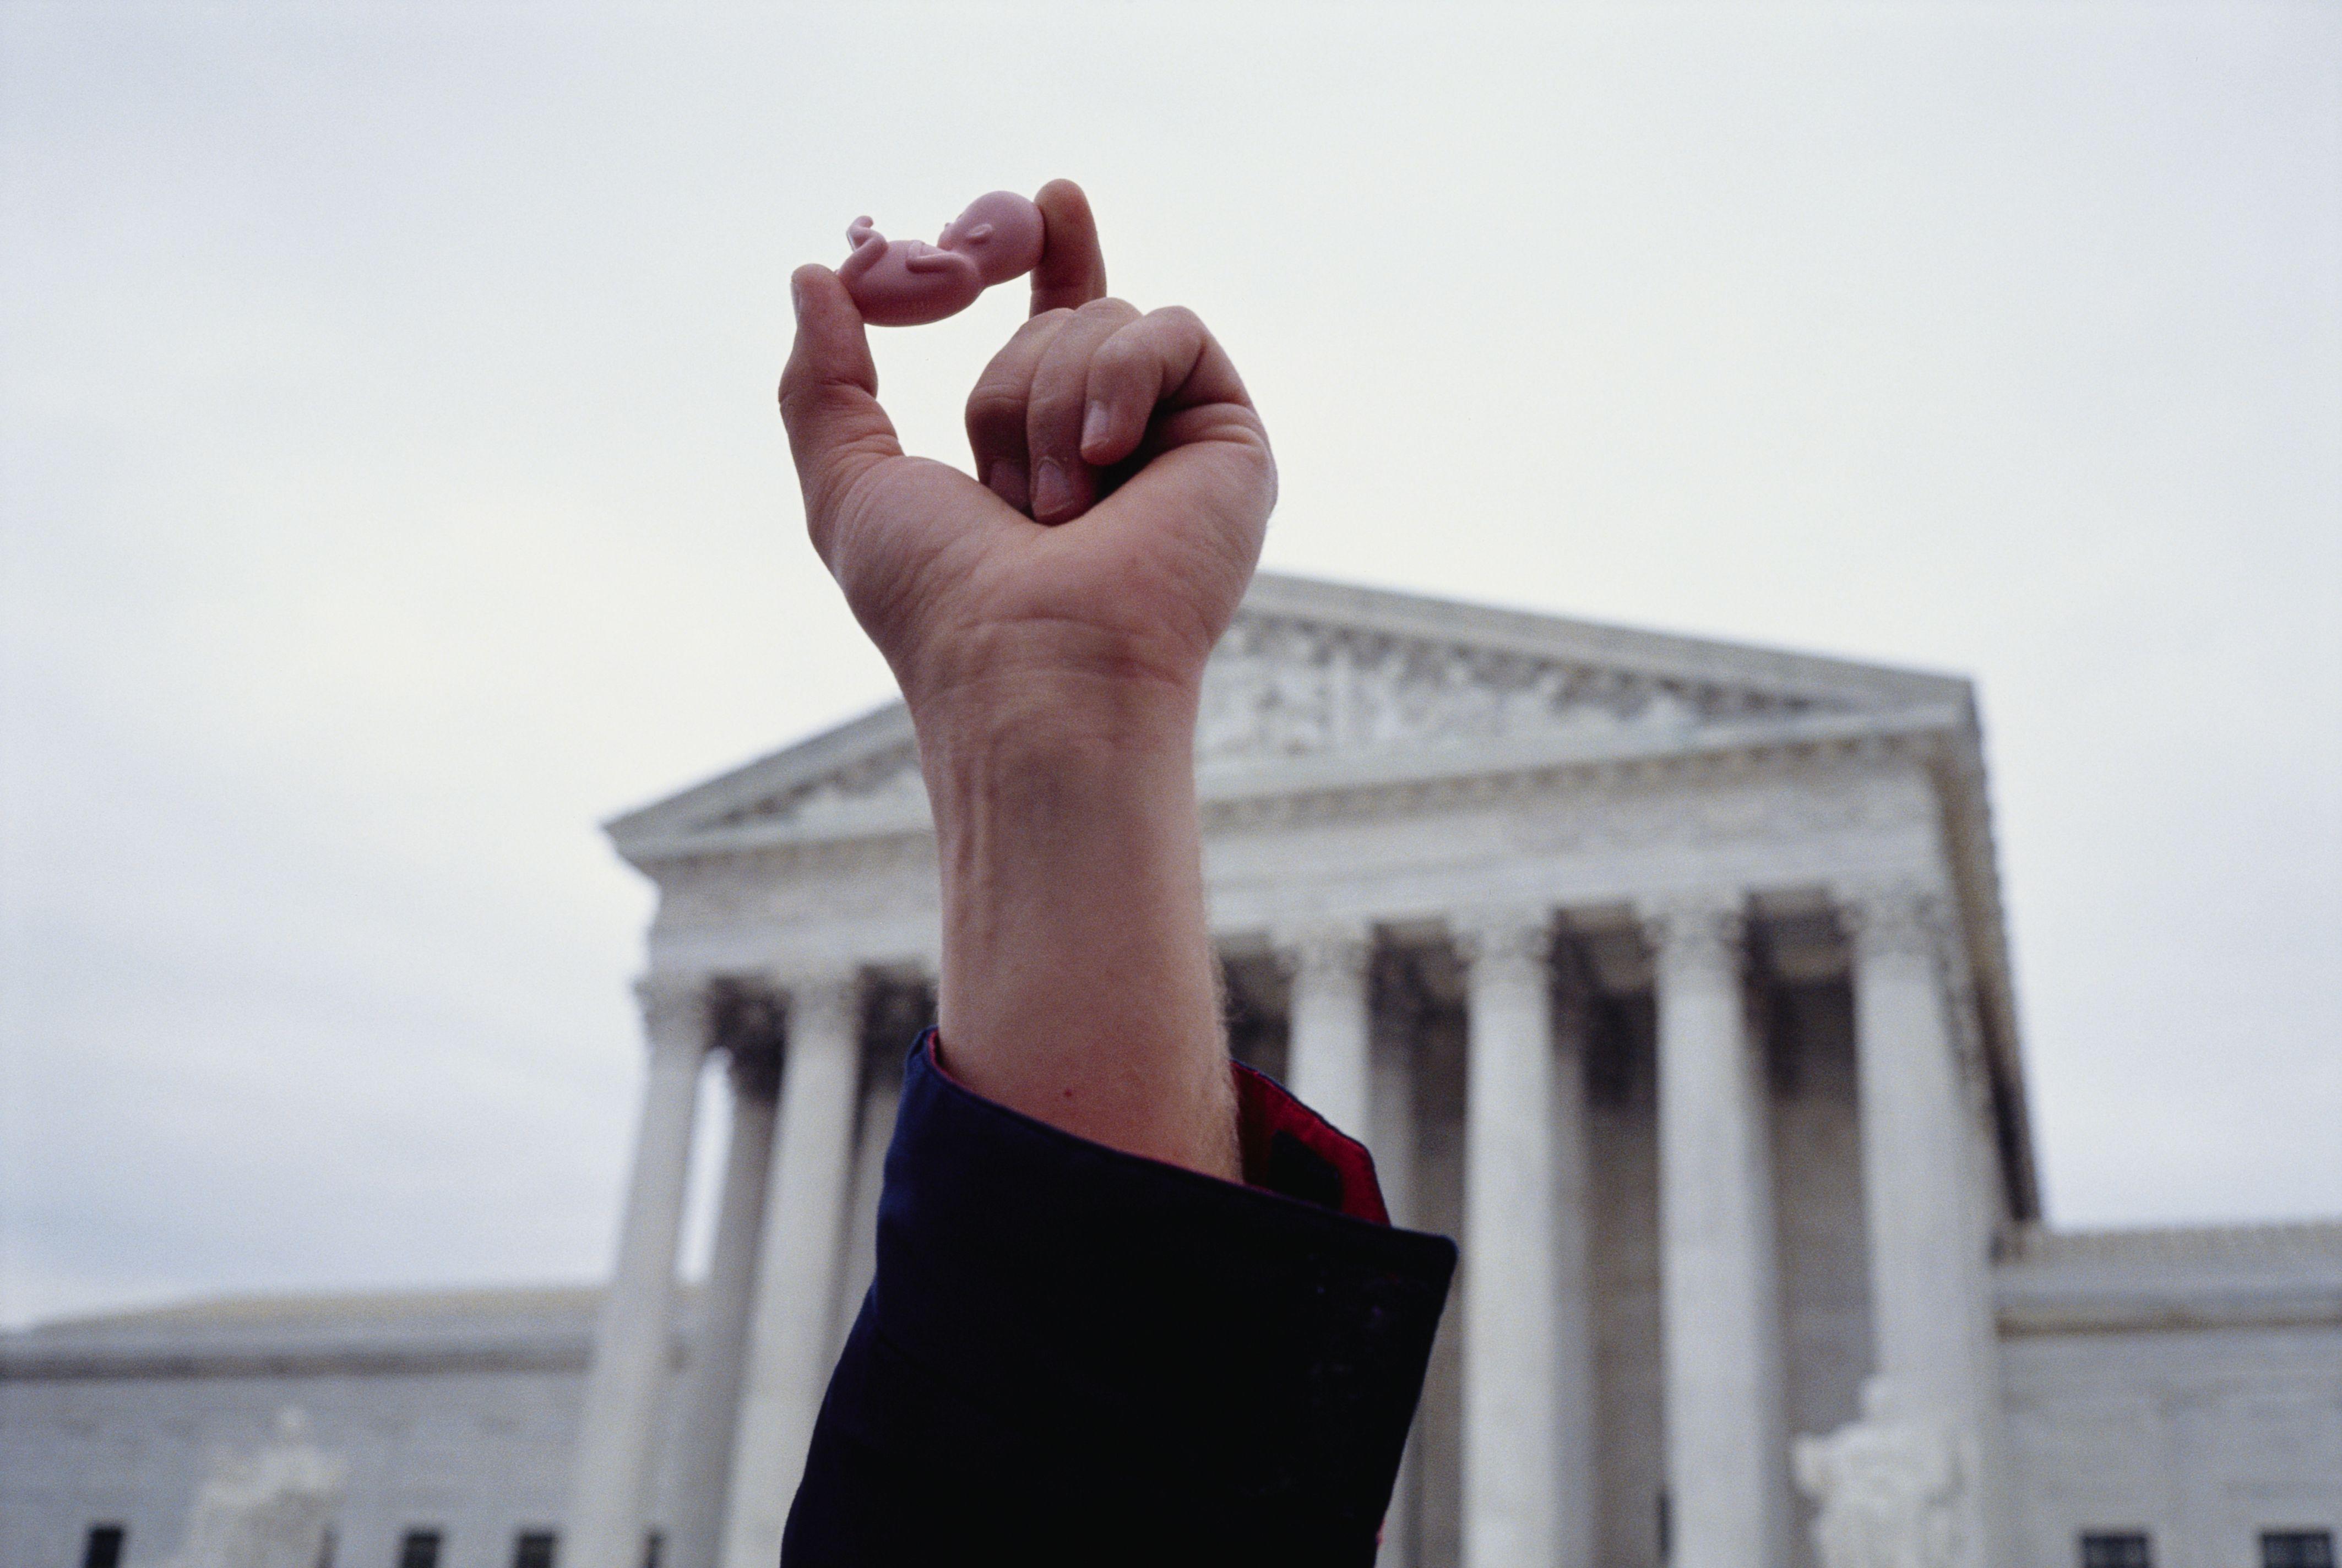 Anti-Abortion Demonstrator Holding Fetus Replica